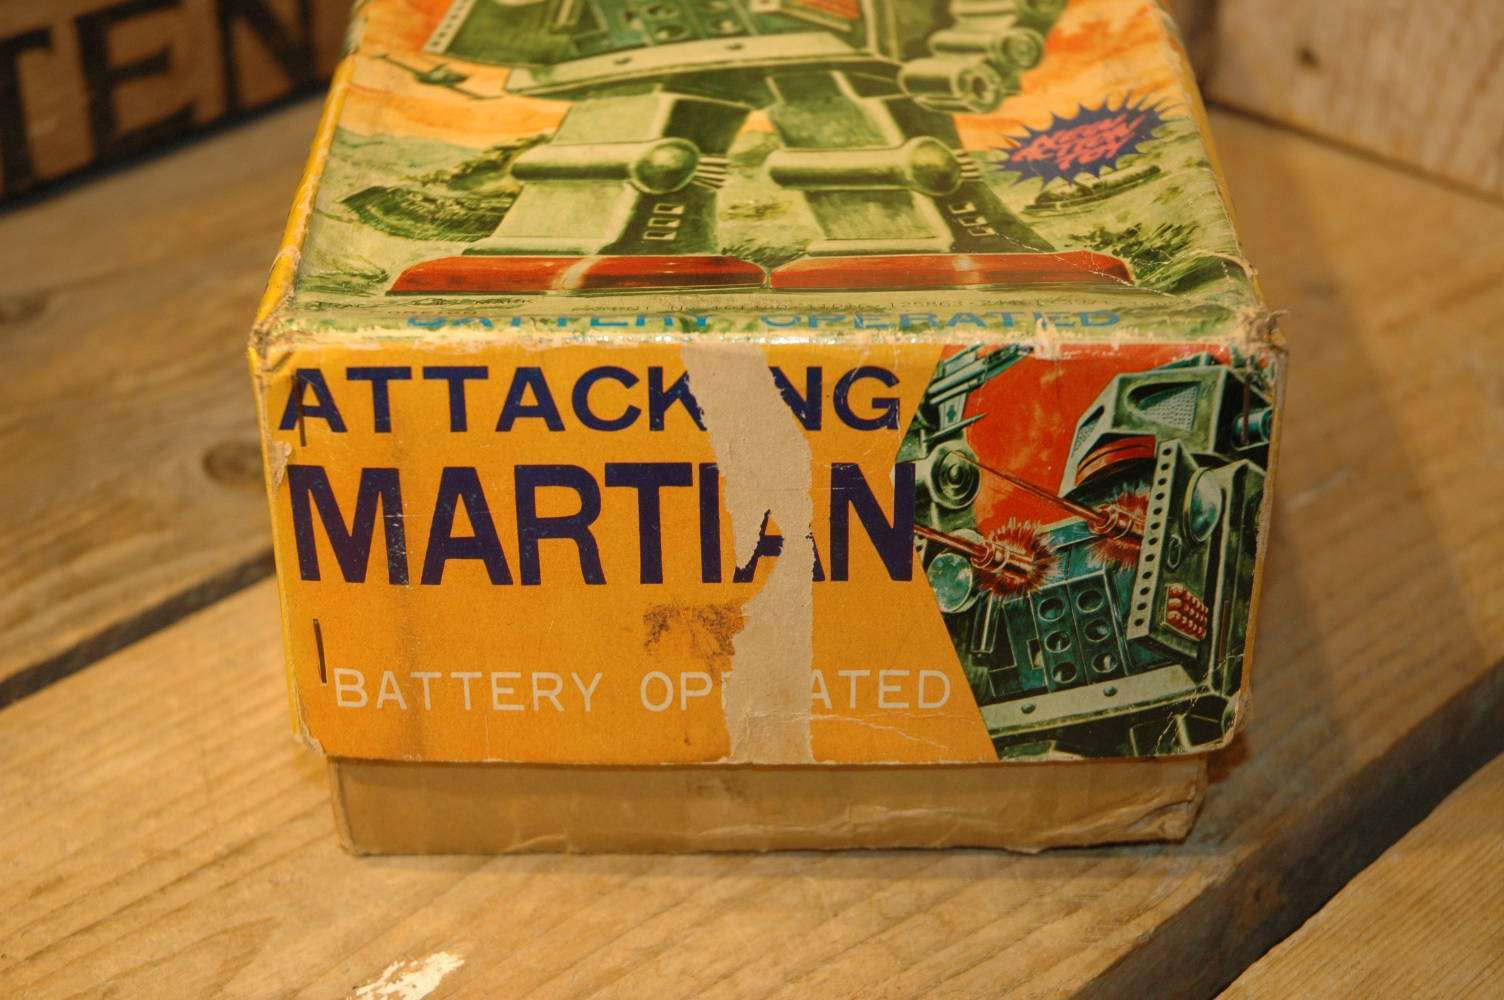 Horikawa - Attacking Martian